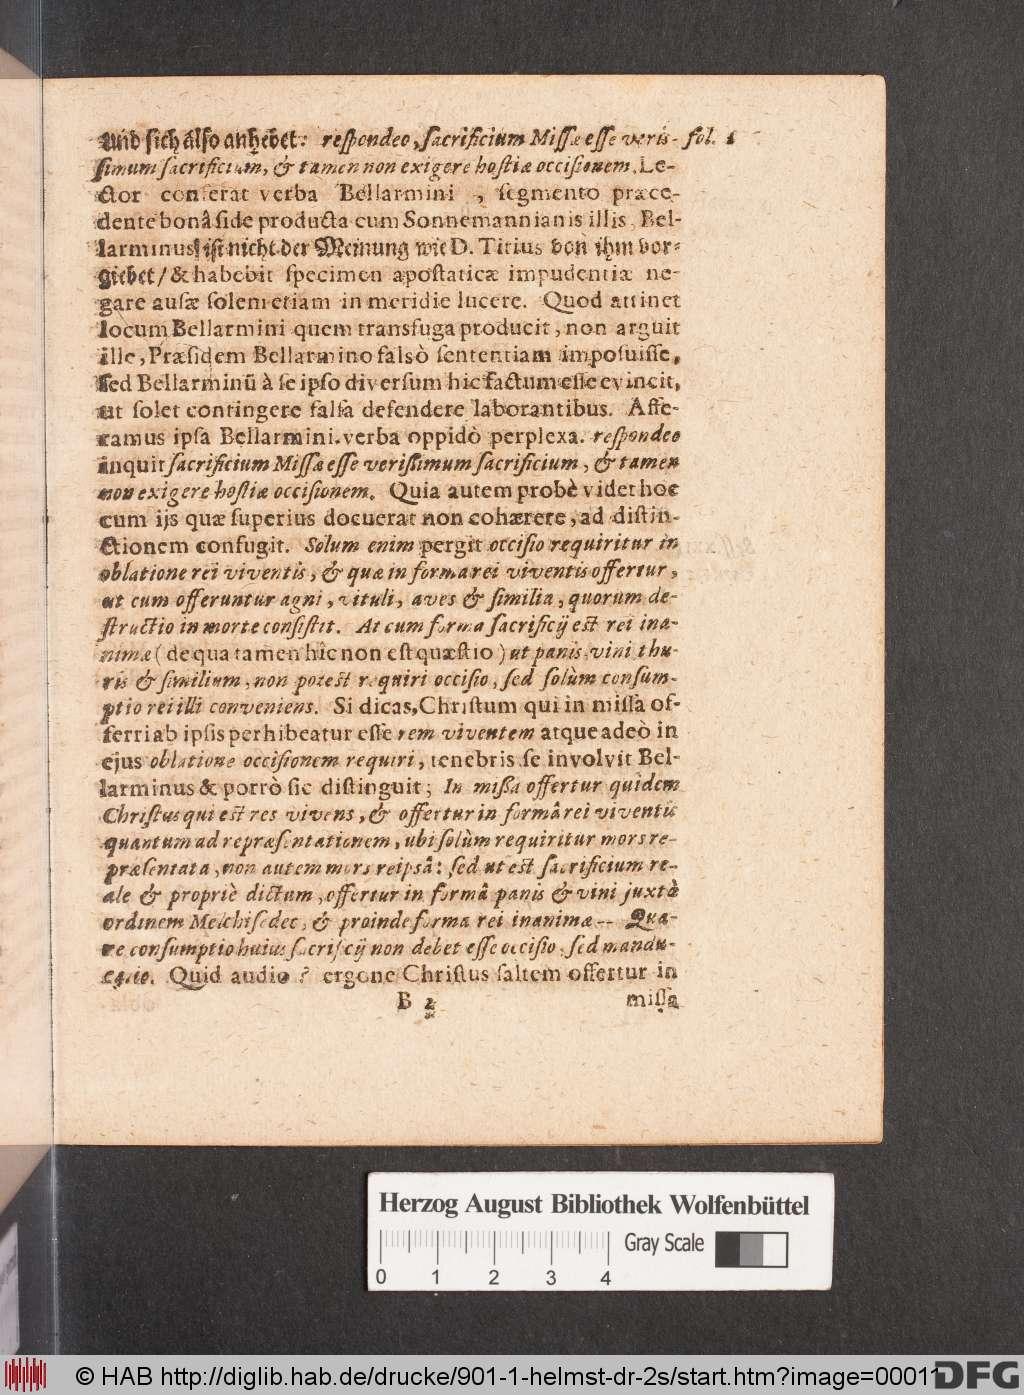 http://diglib.hab.de/drucke/901-1-helmst-dr-2s/00011.jpg